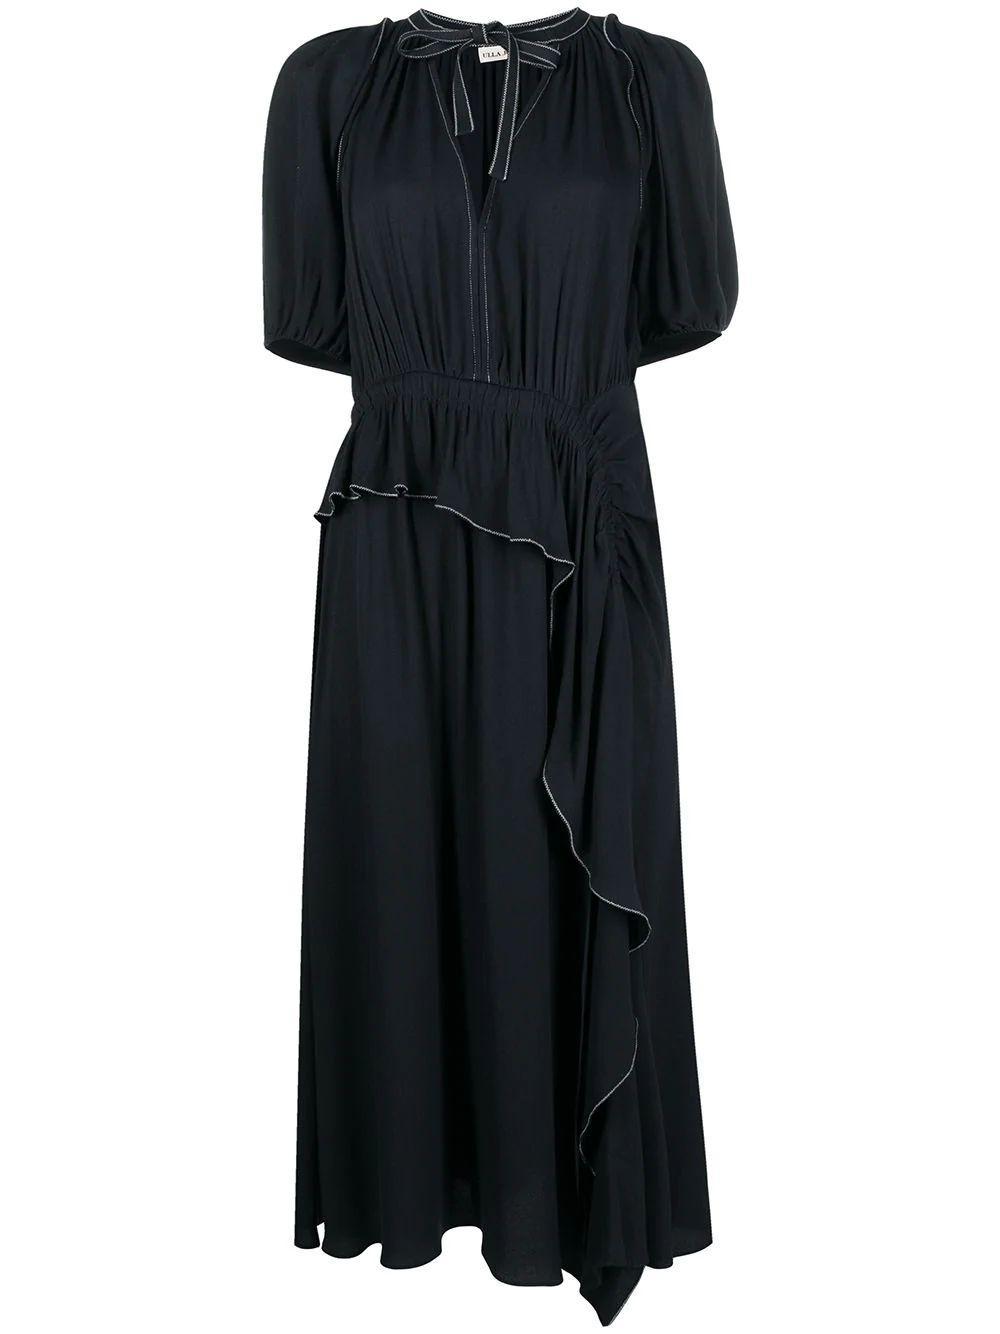 Leah Ruffle Front Dress